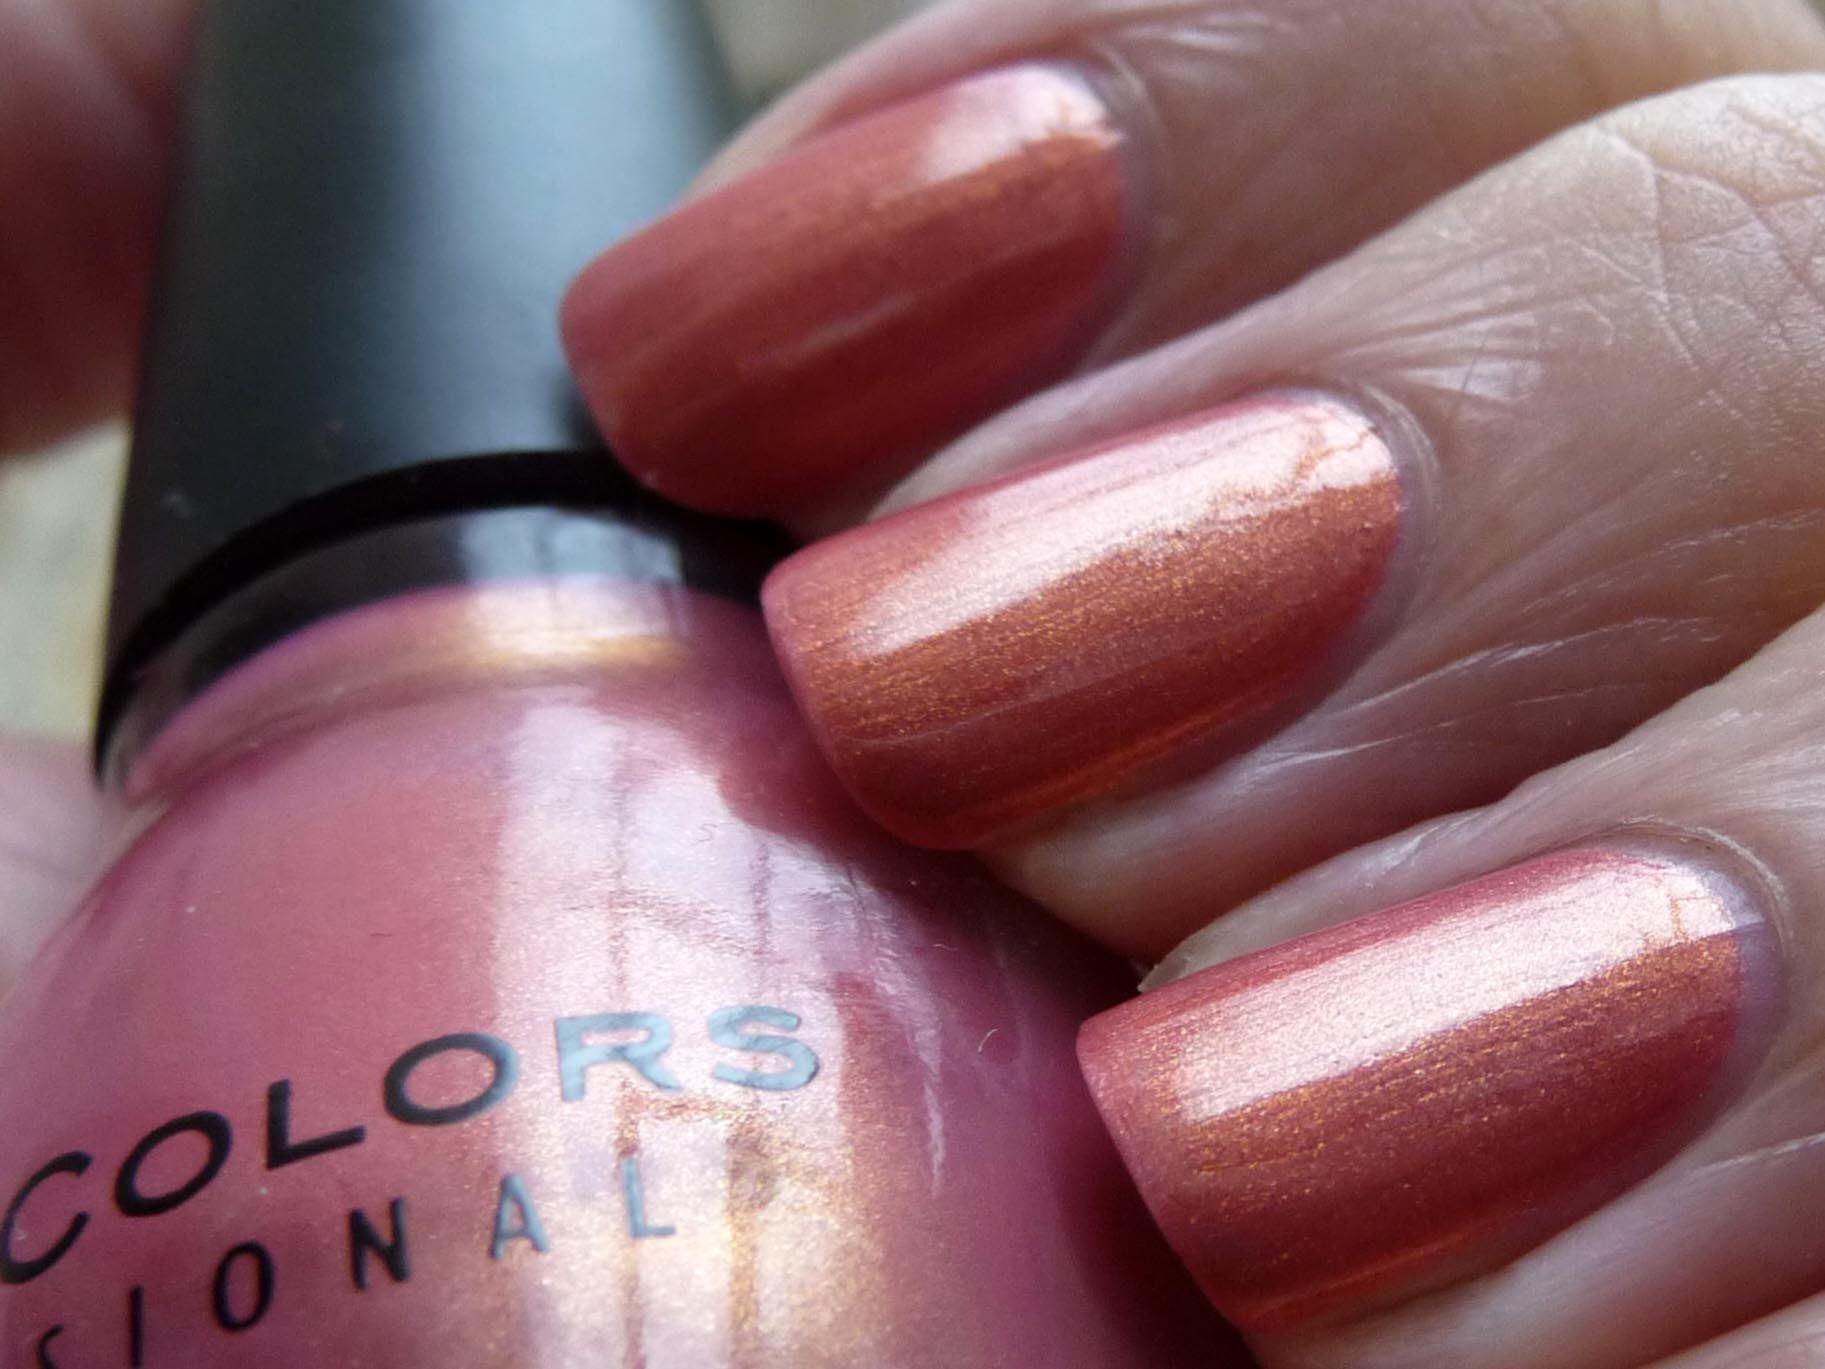 1000 images about nail polish dupes on pinterest deborah lippmann nail polish china glaze and polish - Vernis Sinful Colors